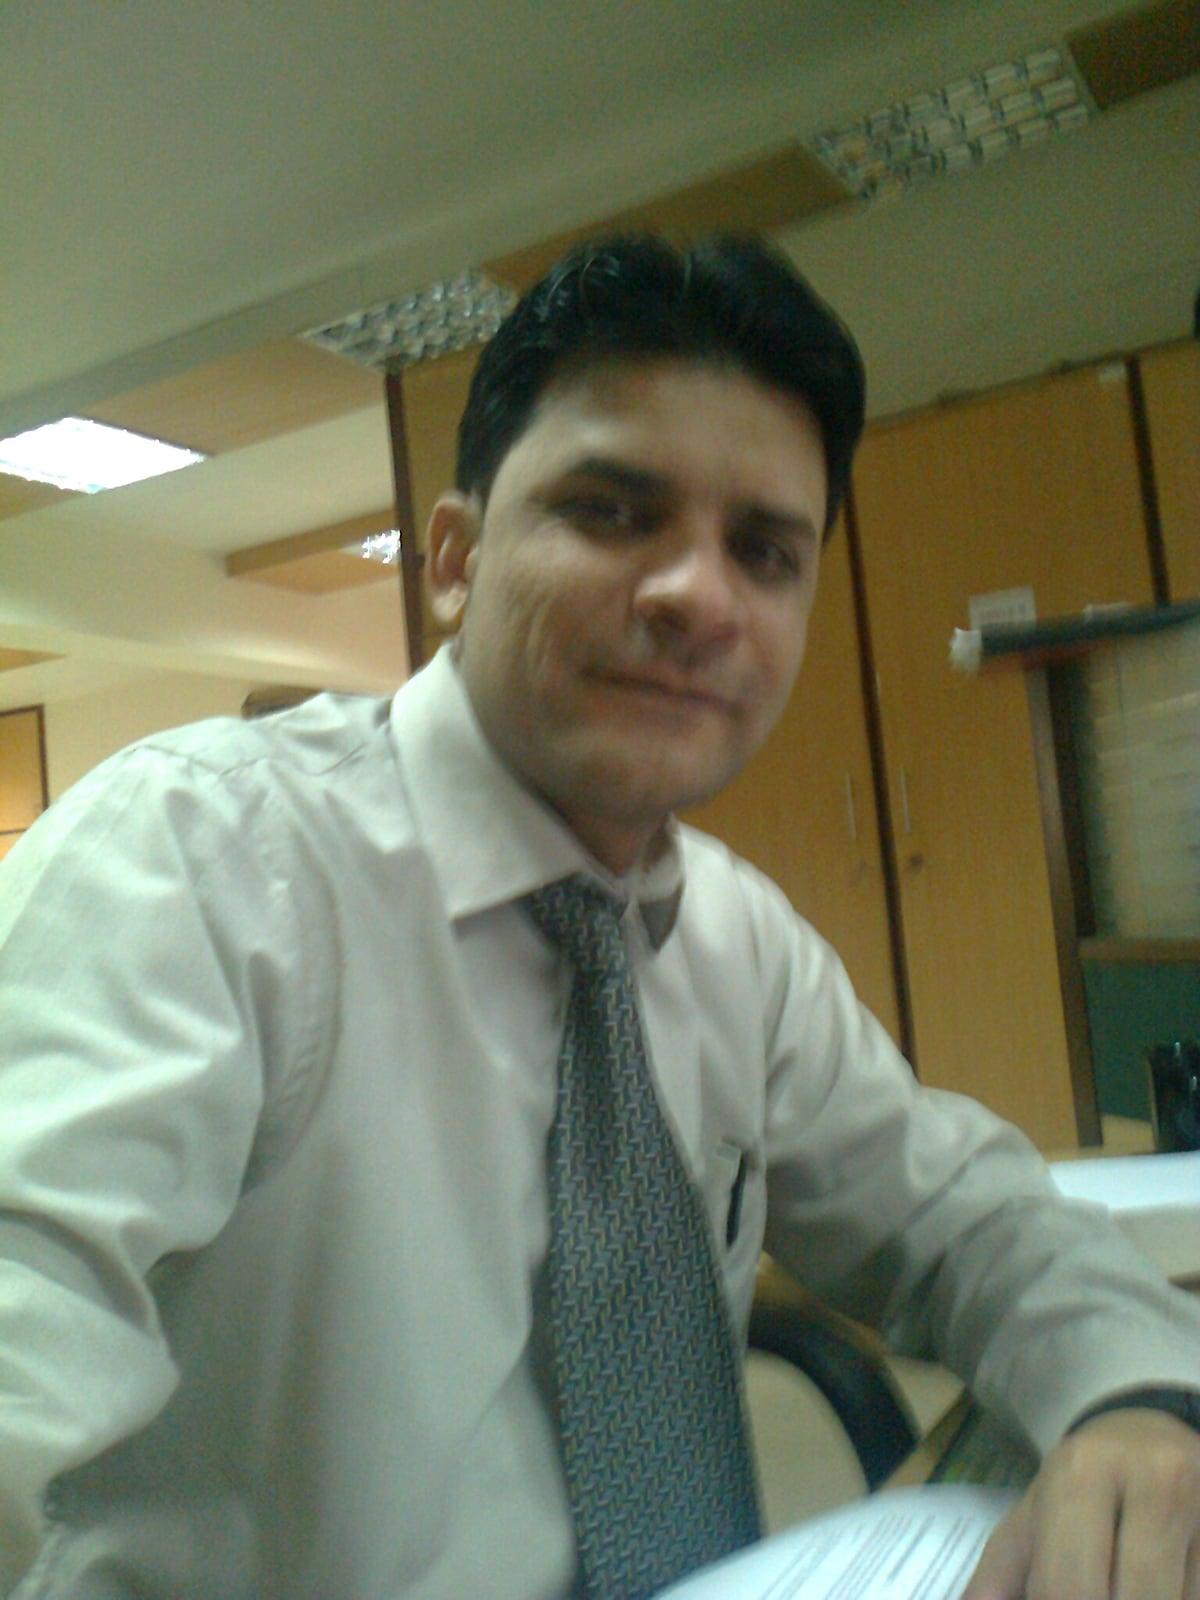 Sultan from Karachi